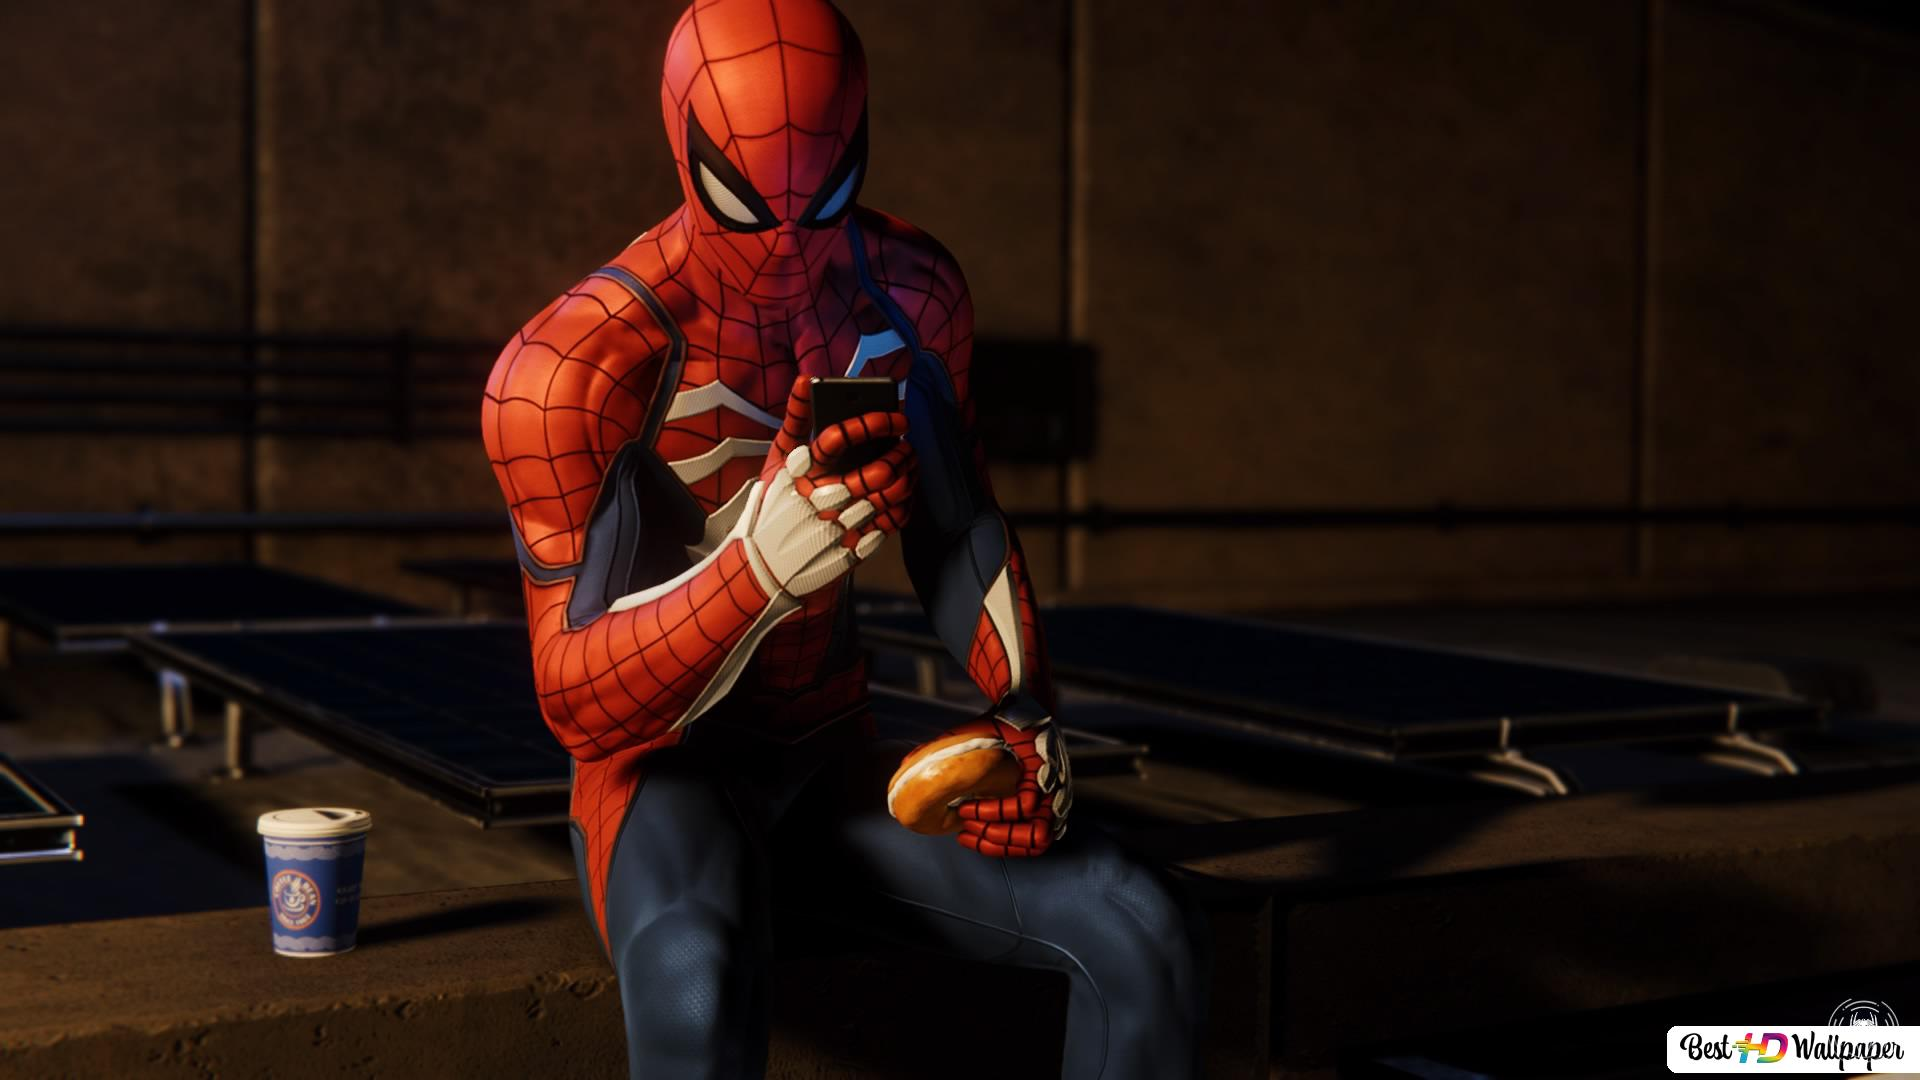 Spiderman Ps4 Hd Wallpaper Download